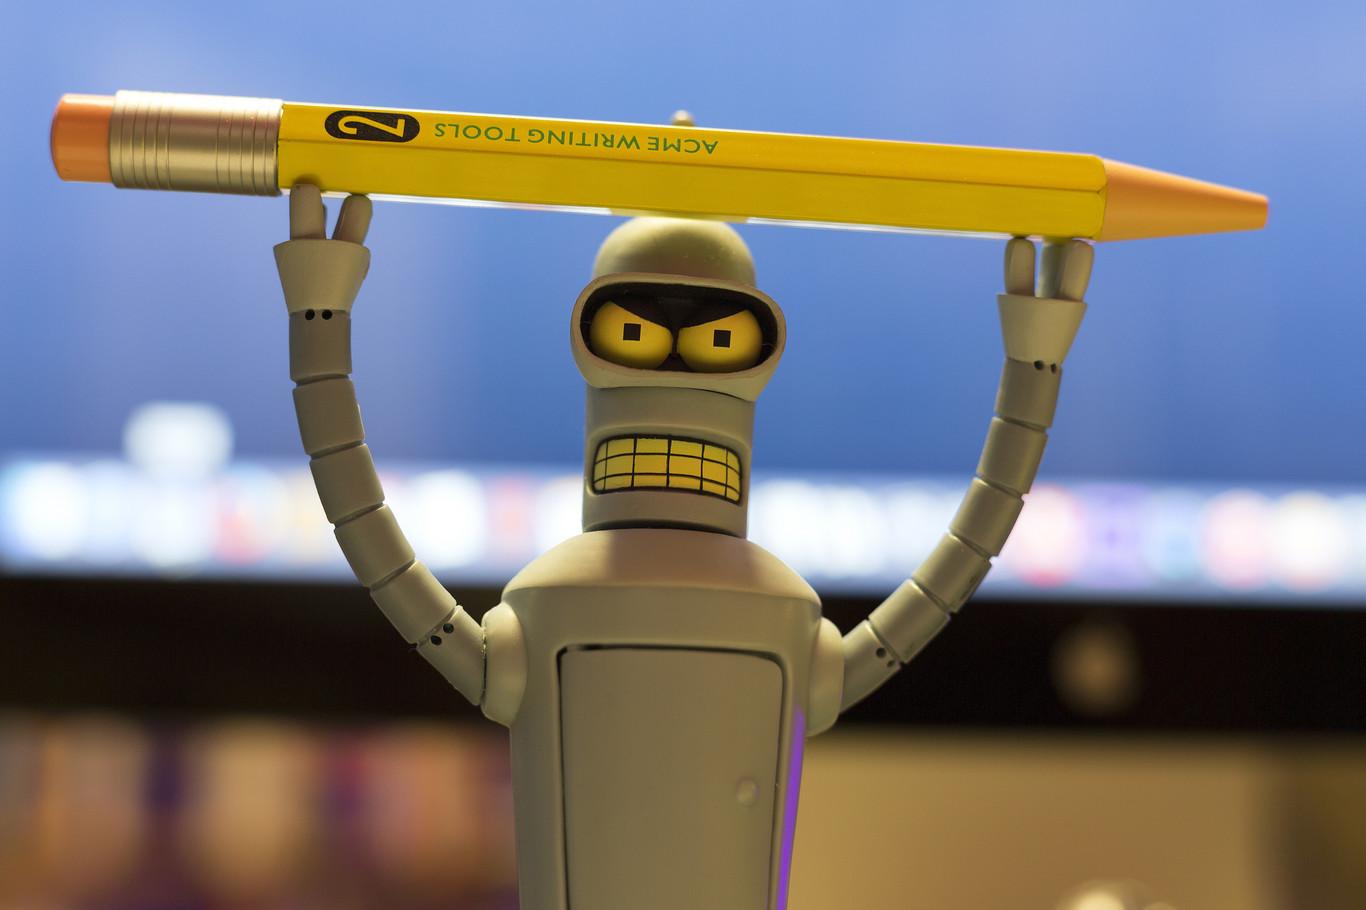 OpenAI dice haber creado una inteligencia artificial capaz de escribir 'deep fakes' de texto pero se niega a difundirla